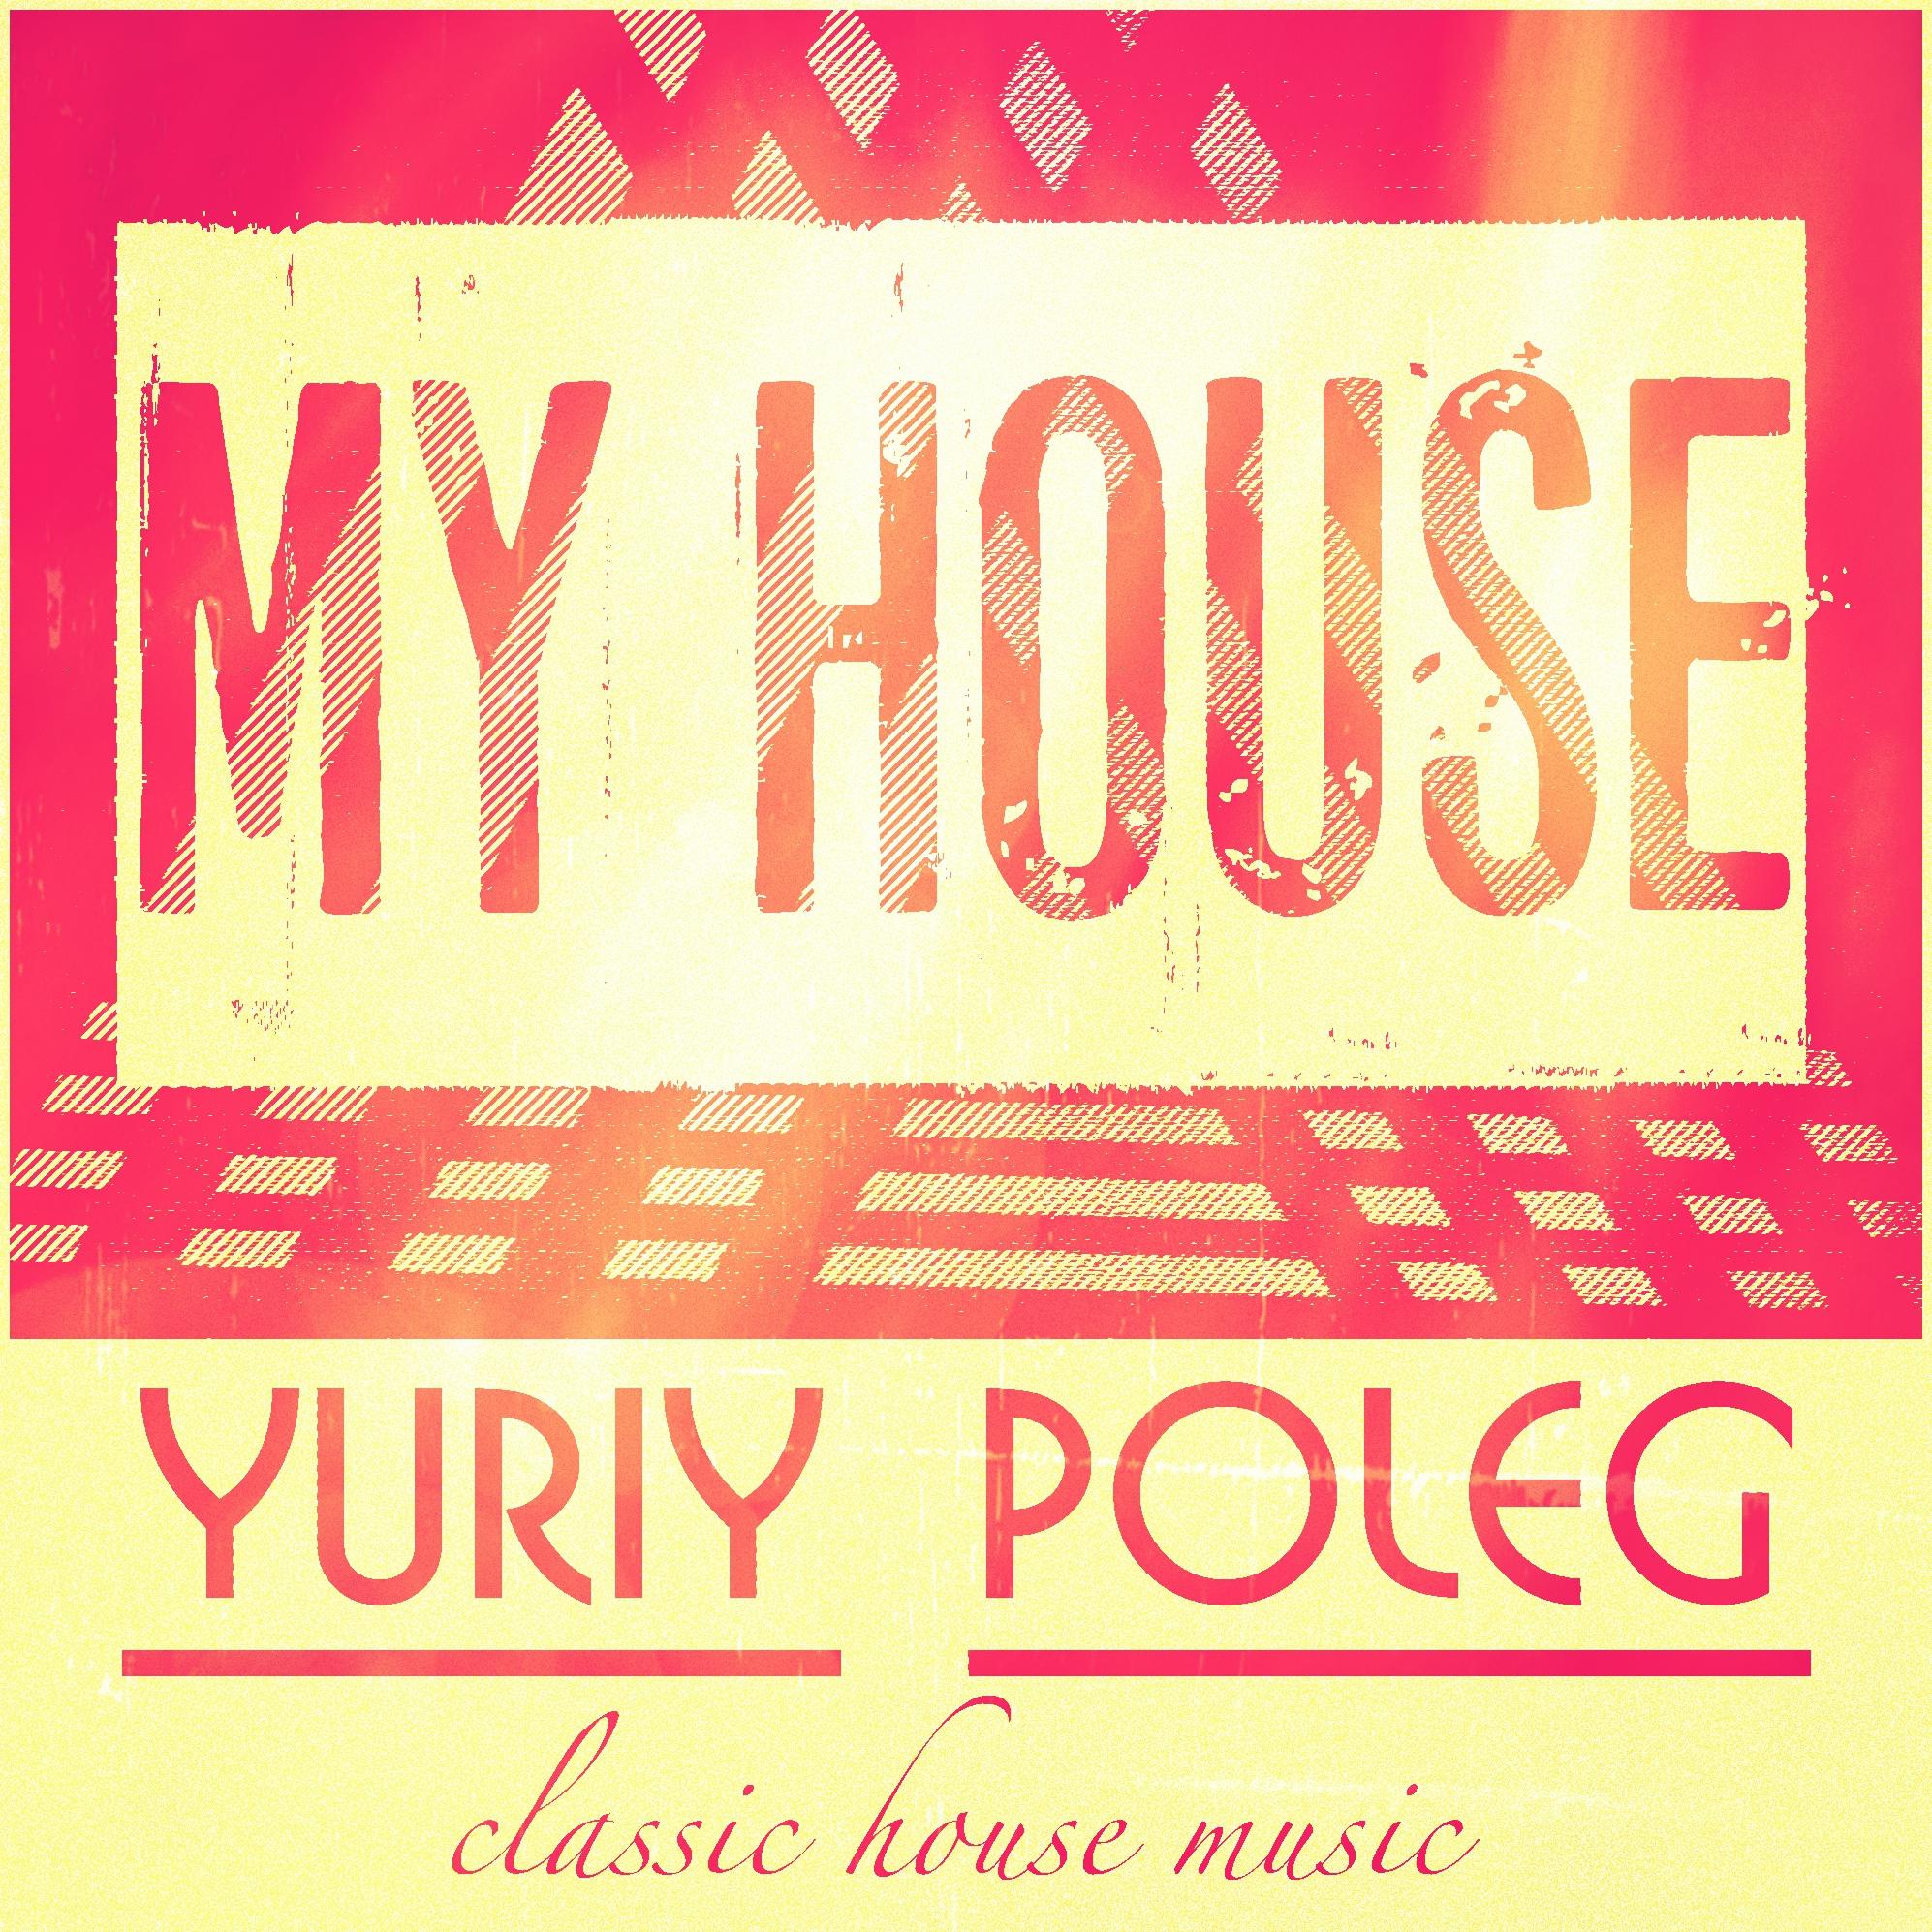 Yuriy Poleg - Swing Melody (Original Mix)